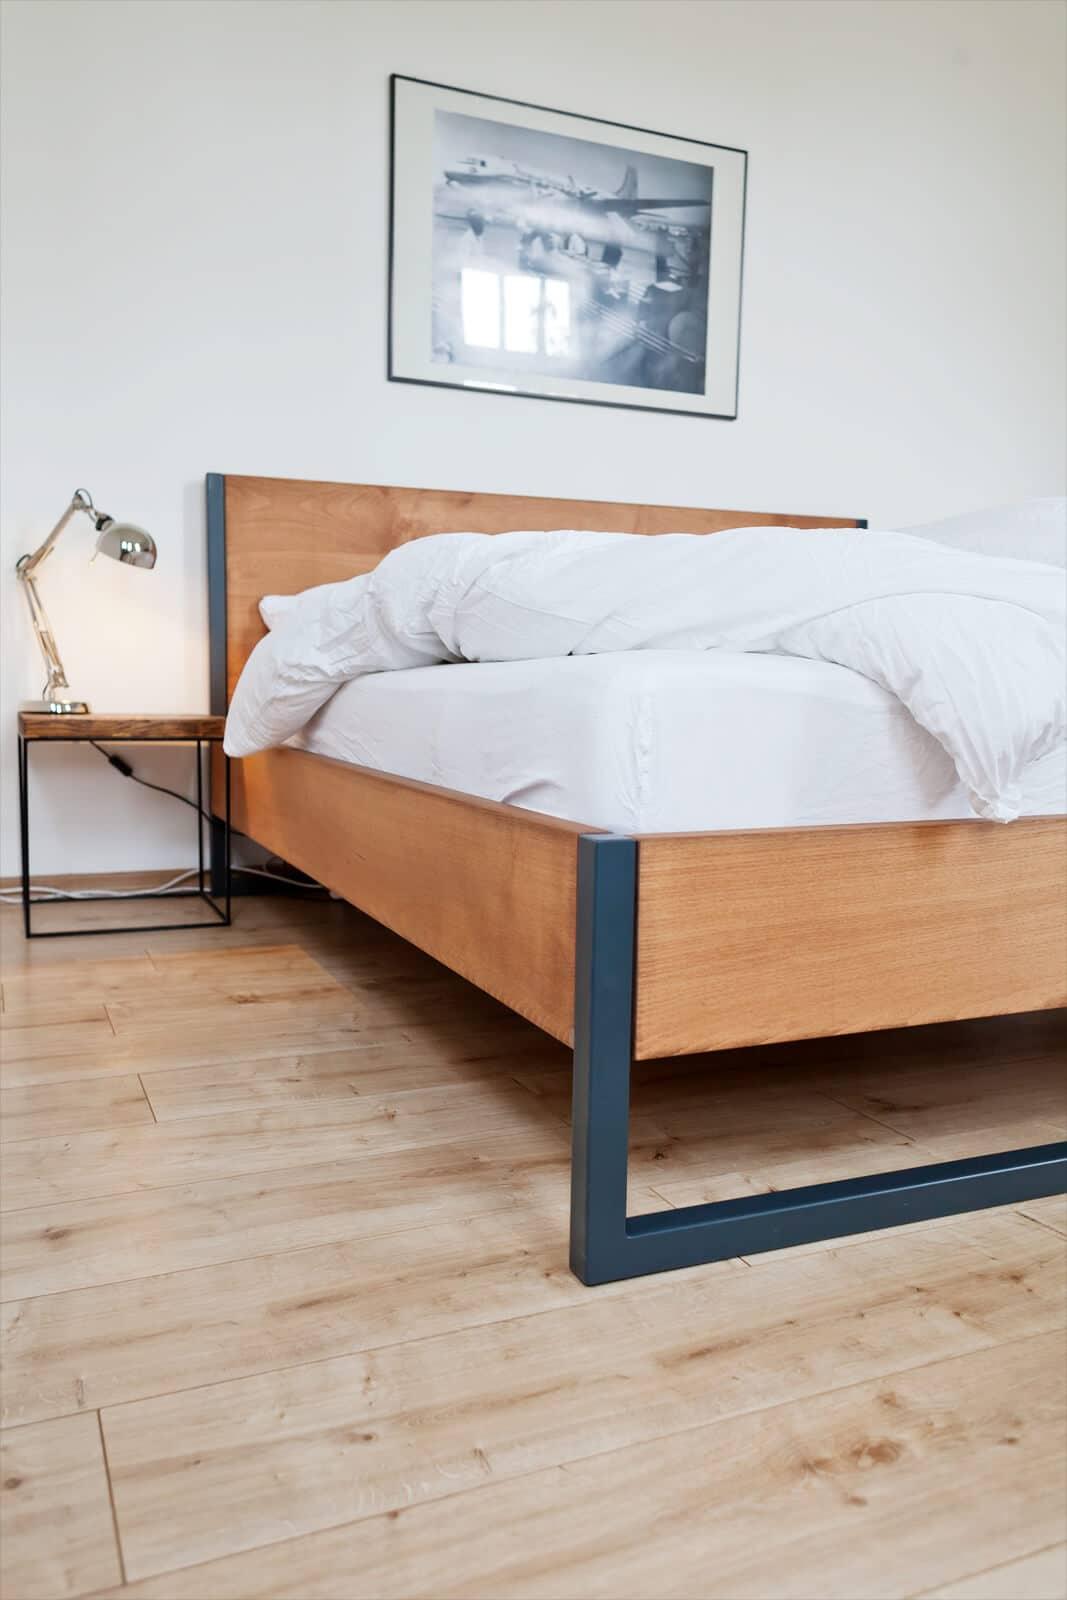 Massivholzbett – Loft Vintage – Massivholz Buche im Stahlgestell N51E12 design & manufacture